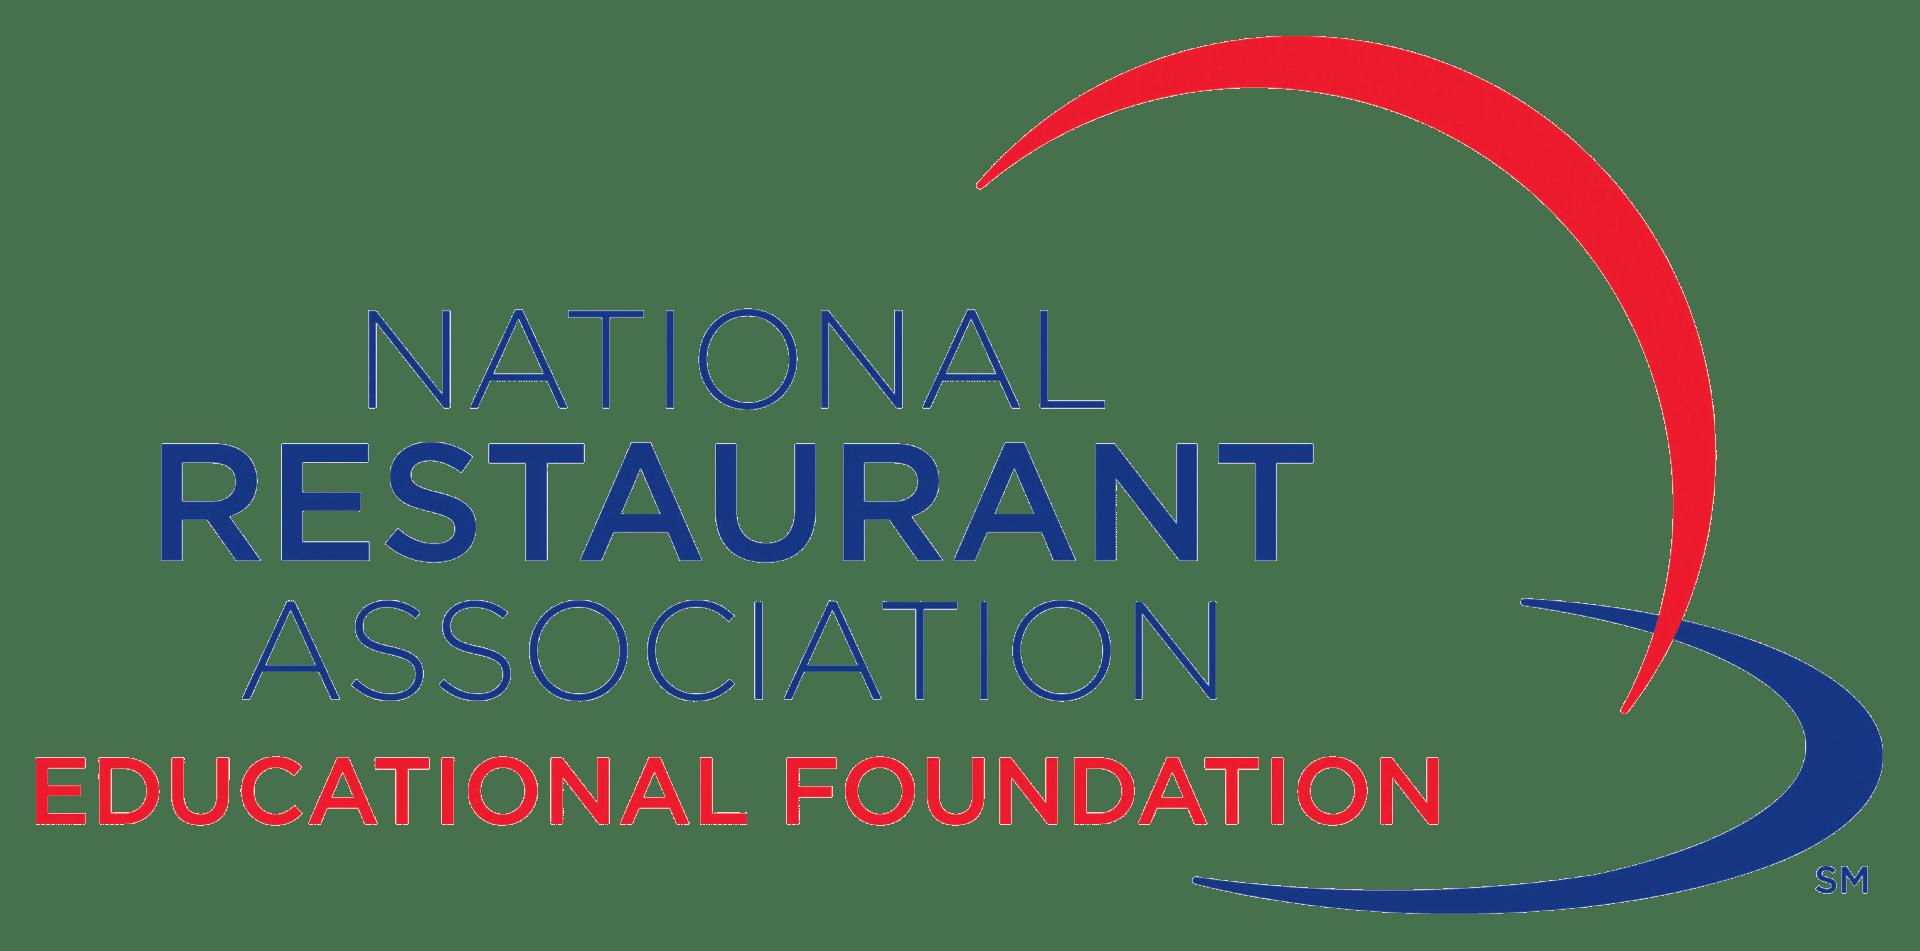 National Restaurant Association Educational Foundation Logo - Employee Retention Credit - Tri-Merit